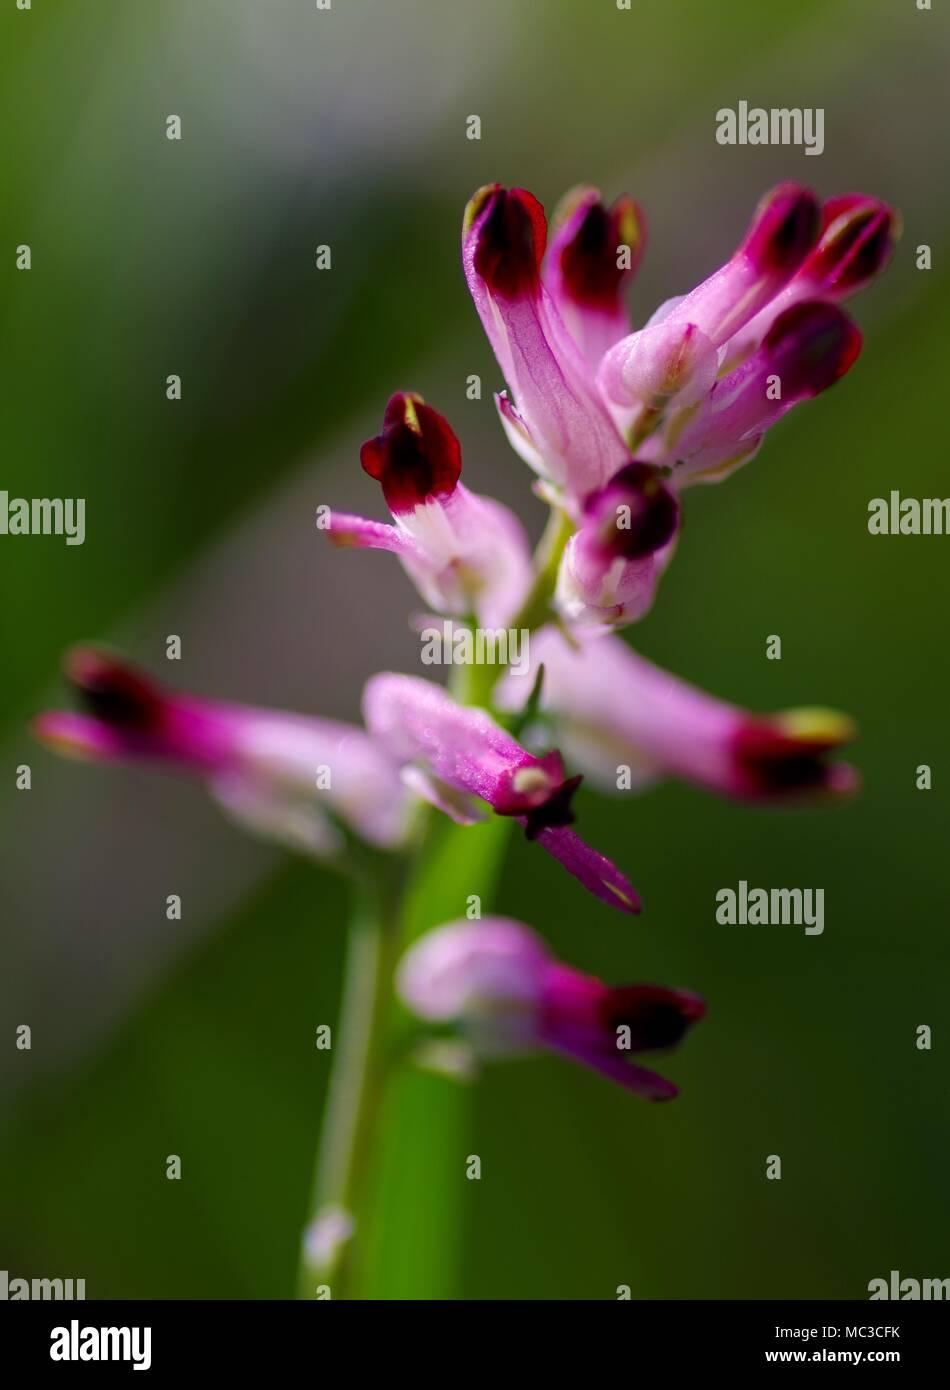 Common Fumitory (Fumaria officinalis). Pink Scrambling Wildflower, Macro Photo. Growing on Dawlish Warren Nature Reserve. Devon, UK. - Stock Image